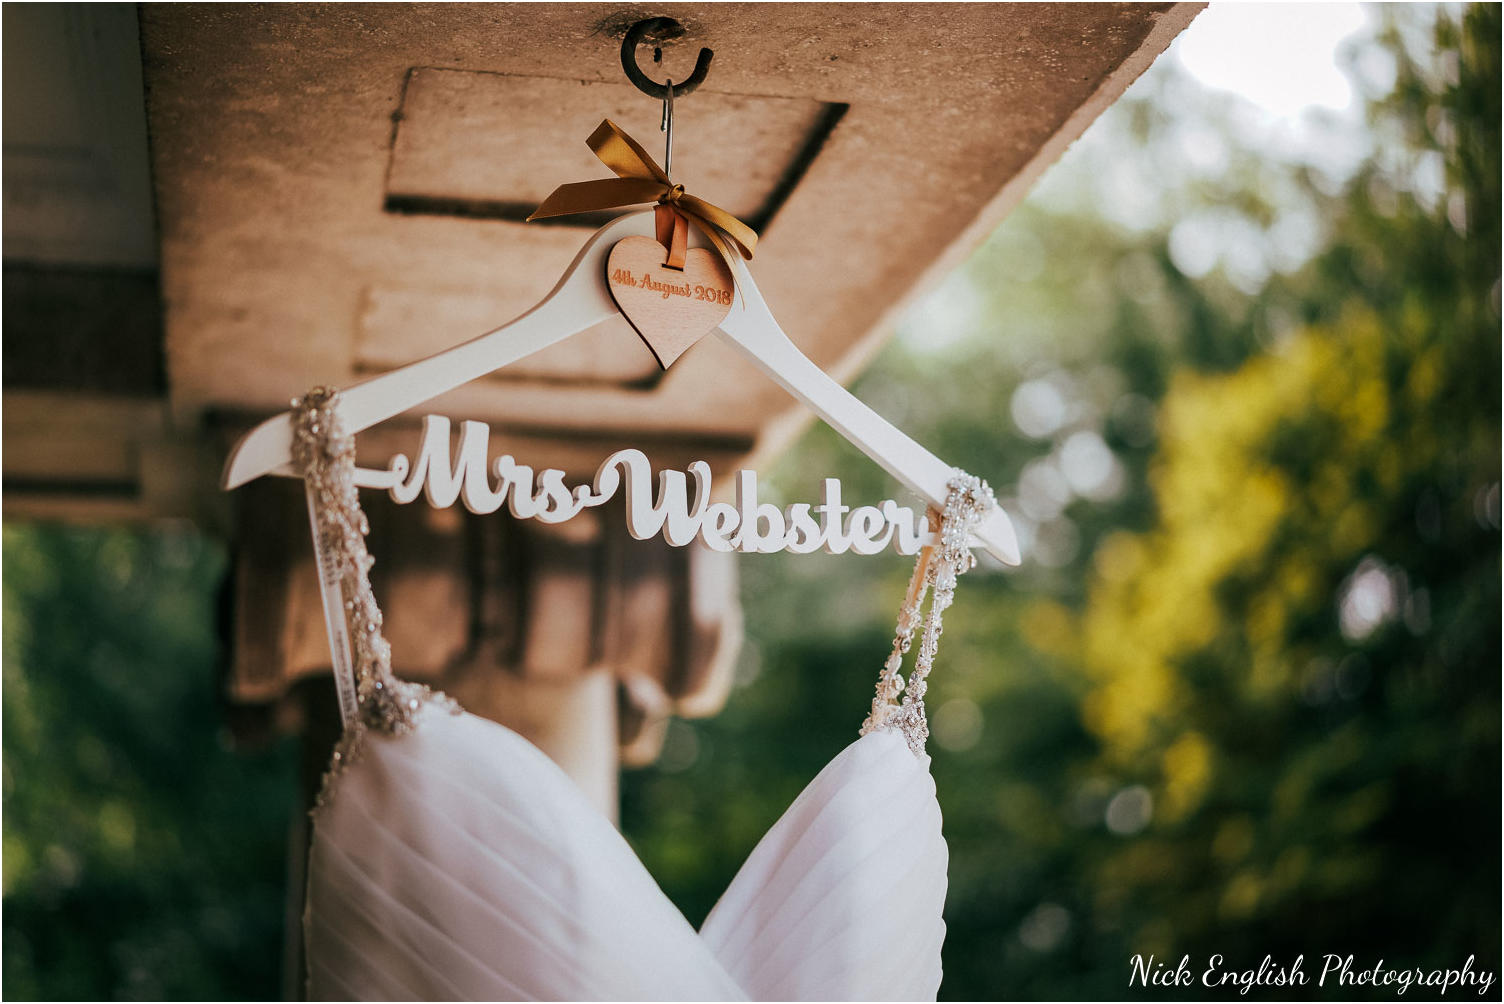 Eaves_Hall_Outdoor_Wedding-2.jpg